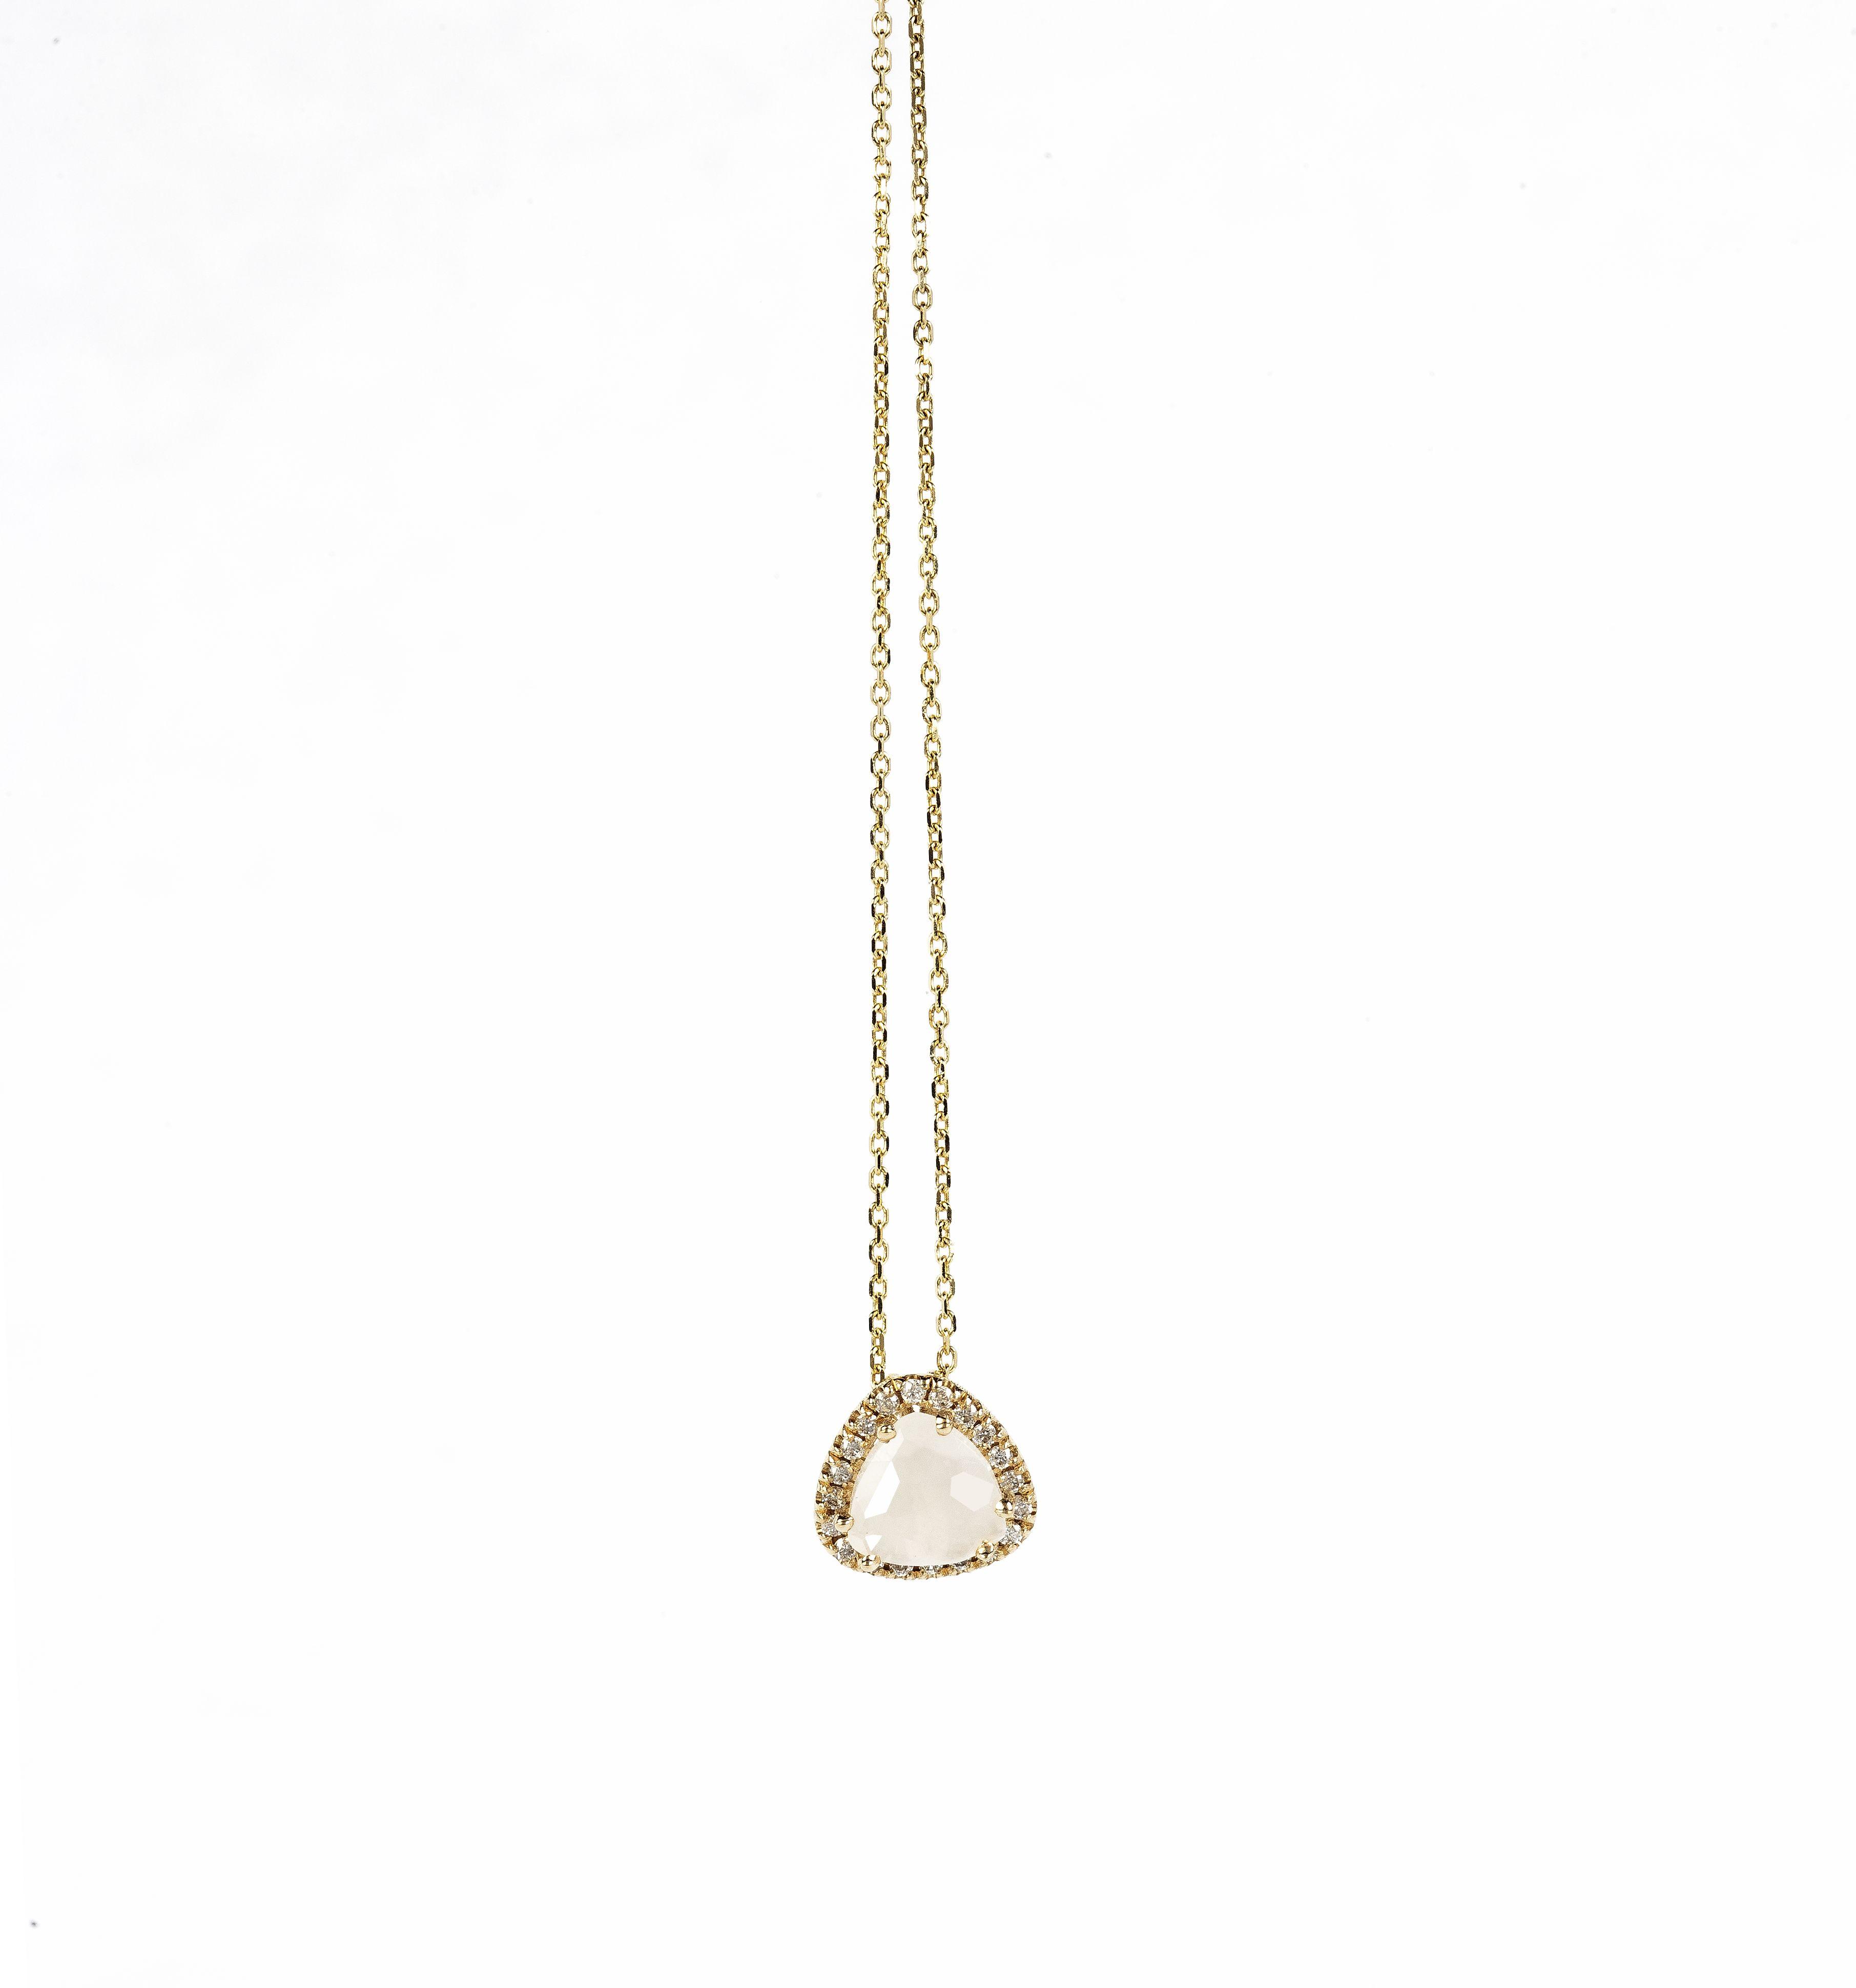 KALAN by Suzanne Kalan - 14K Yellow Gold Necklace - White Moonstone - White Diamonds